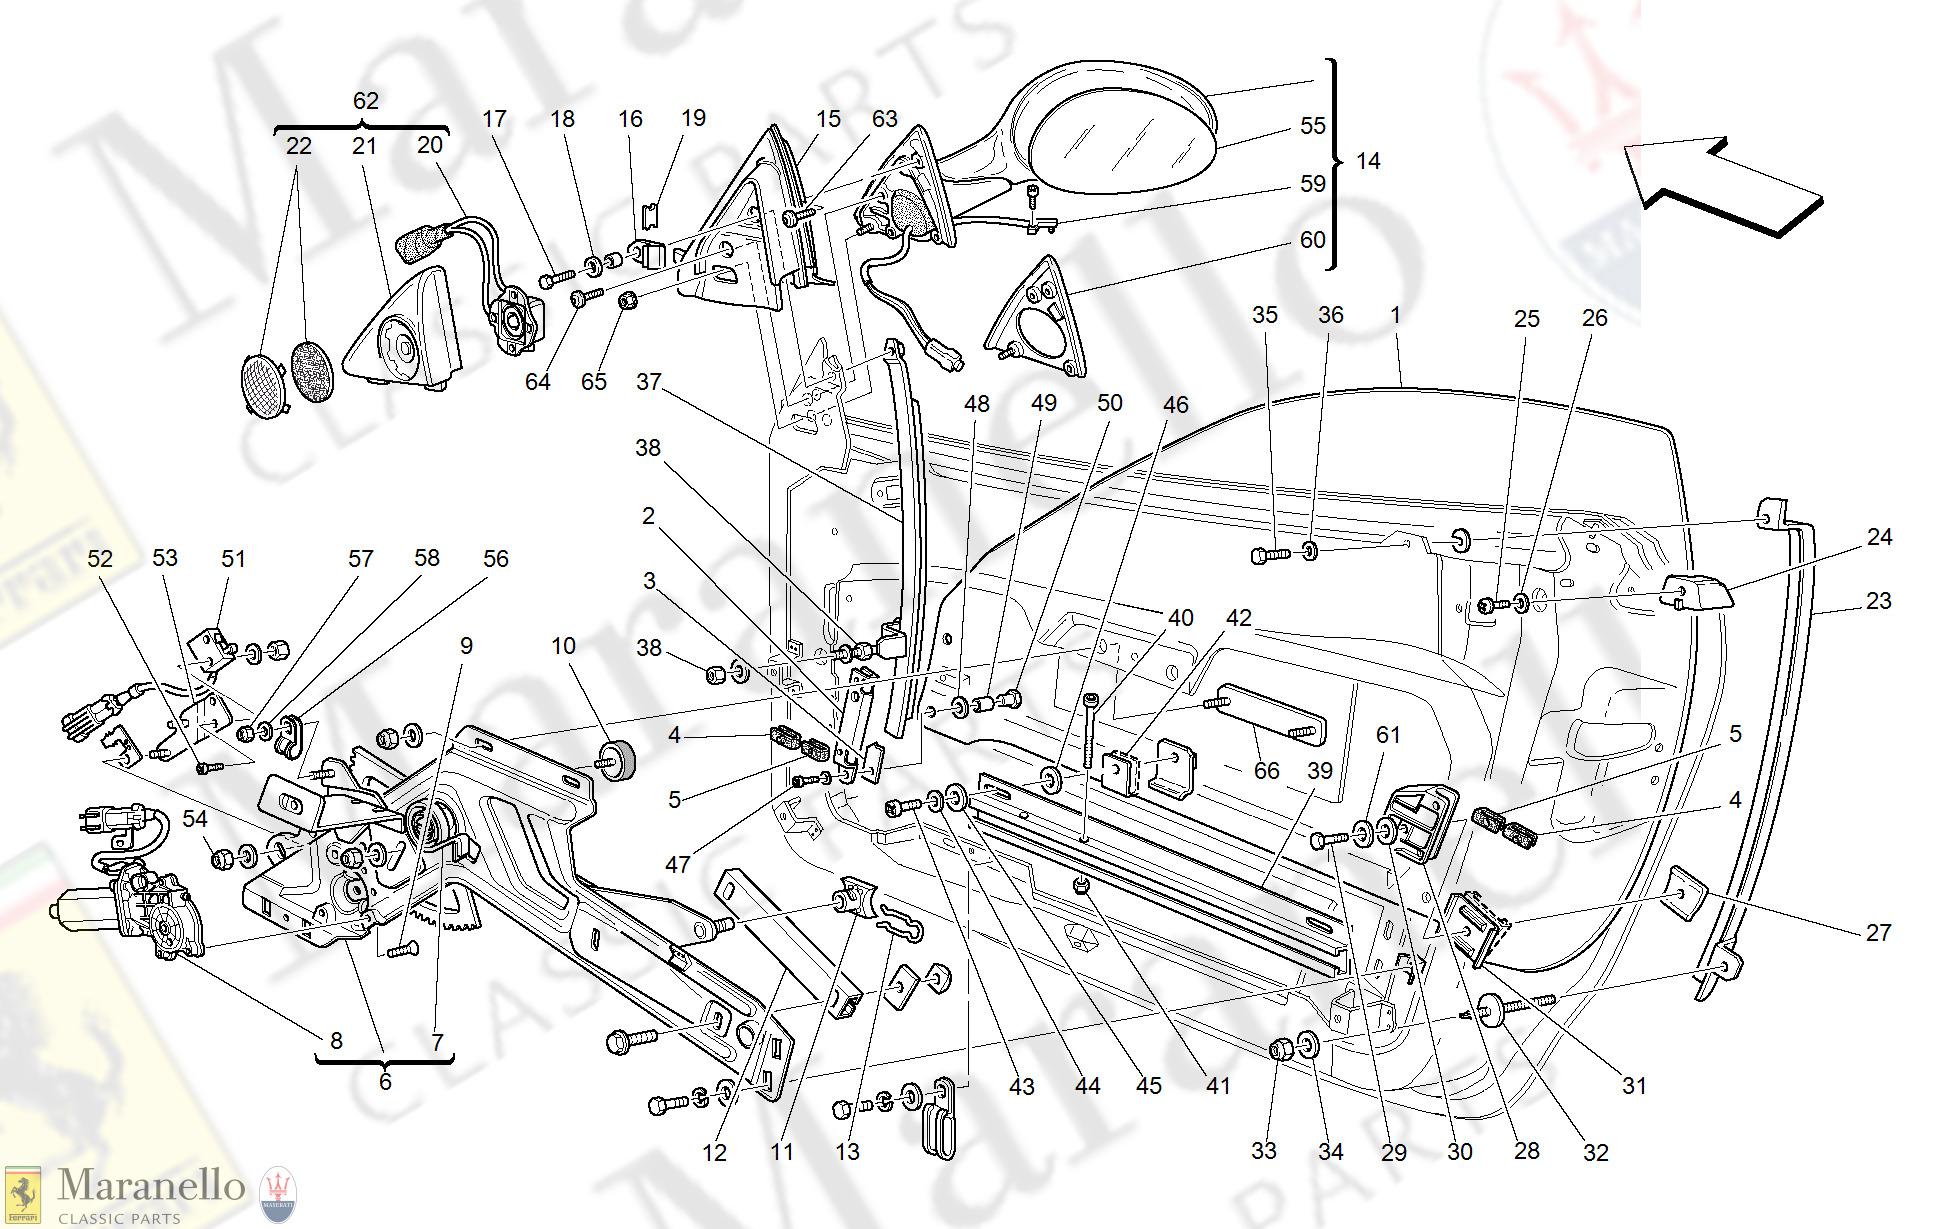 118 Doors Power Window And Rearview Mirror Parts Diagram For Ferrari 360 Modena Maranello Classic Parts